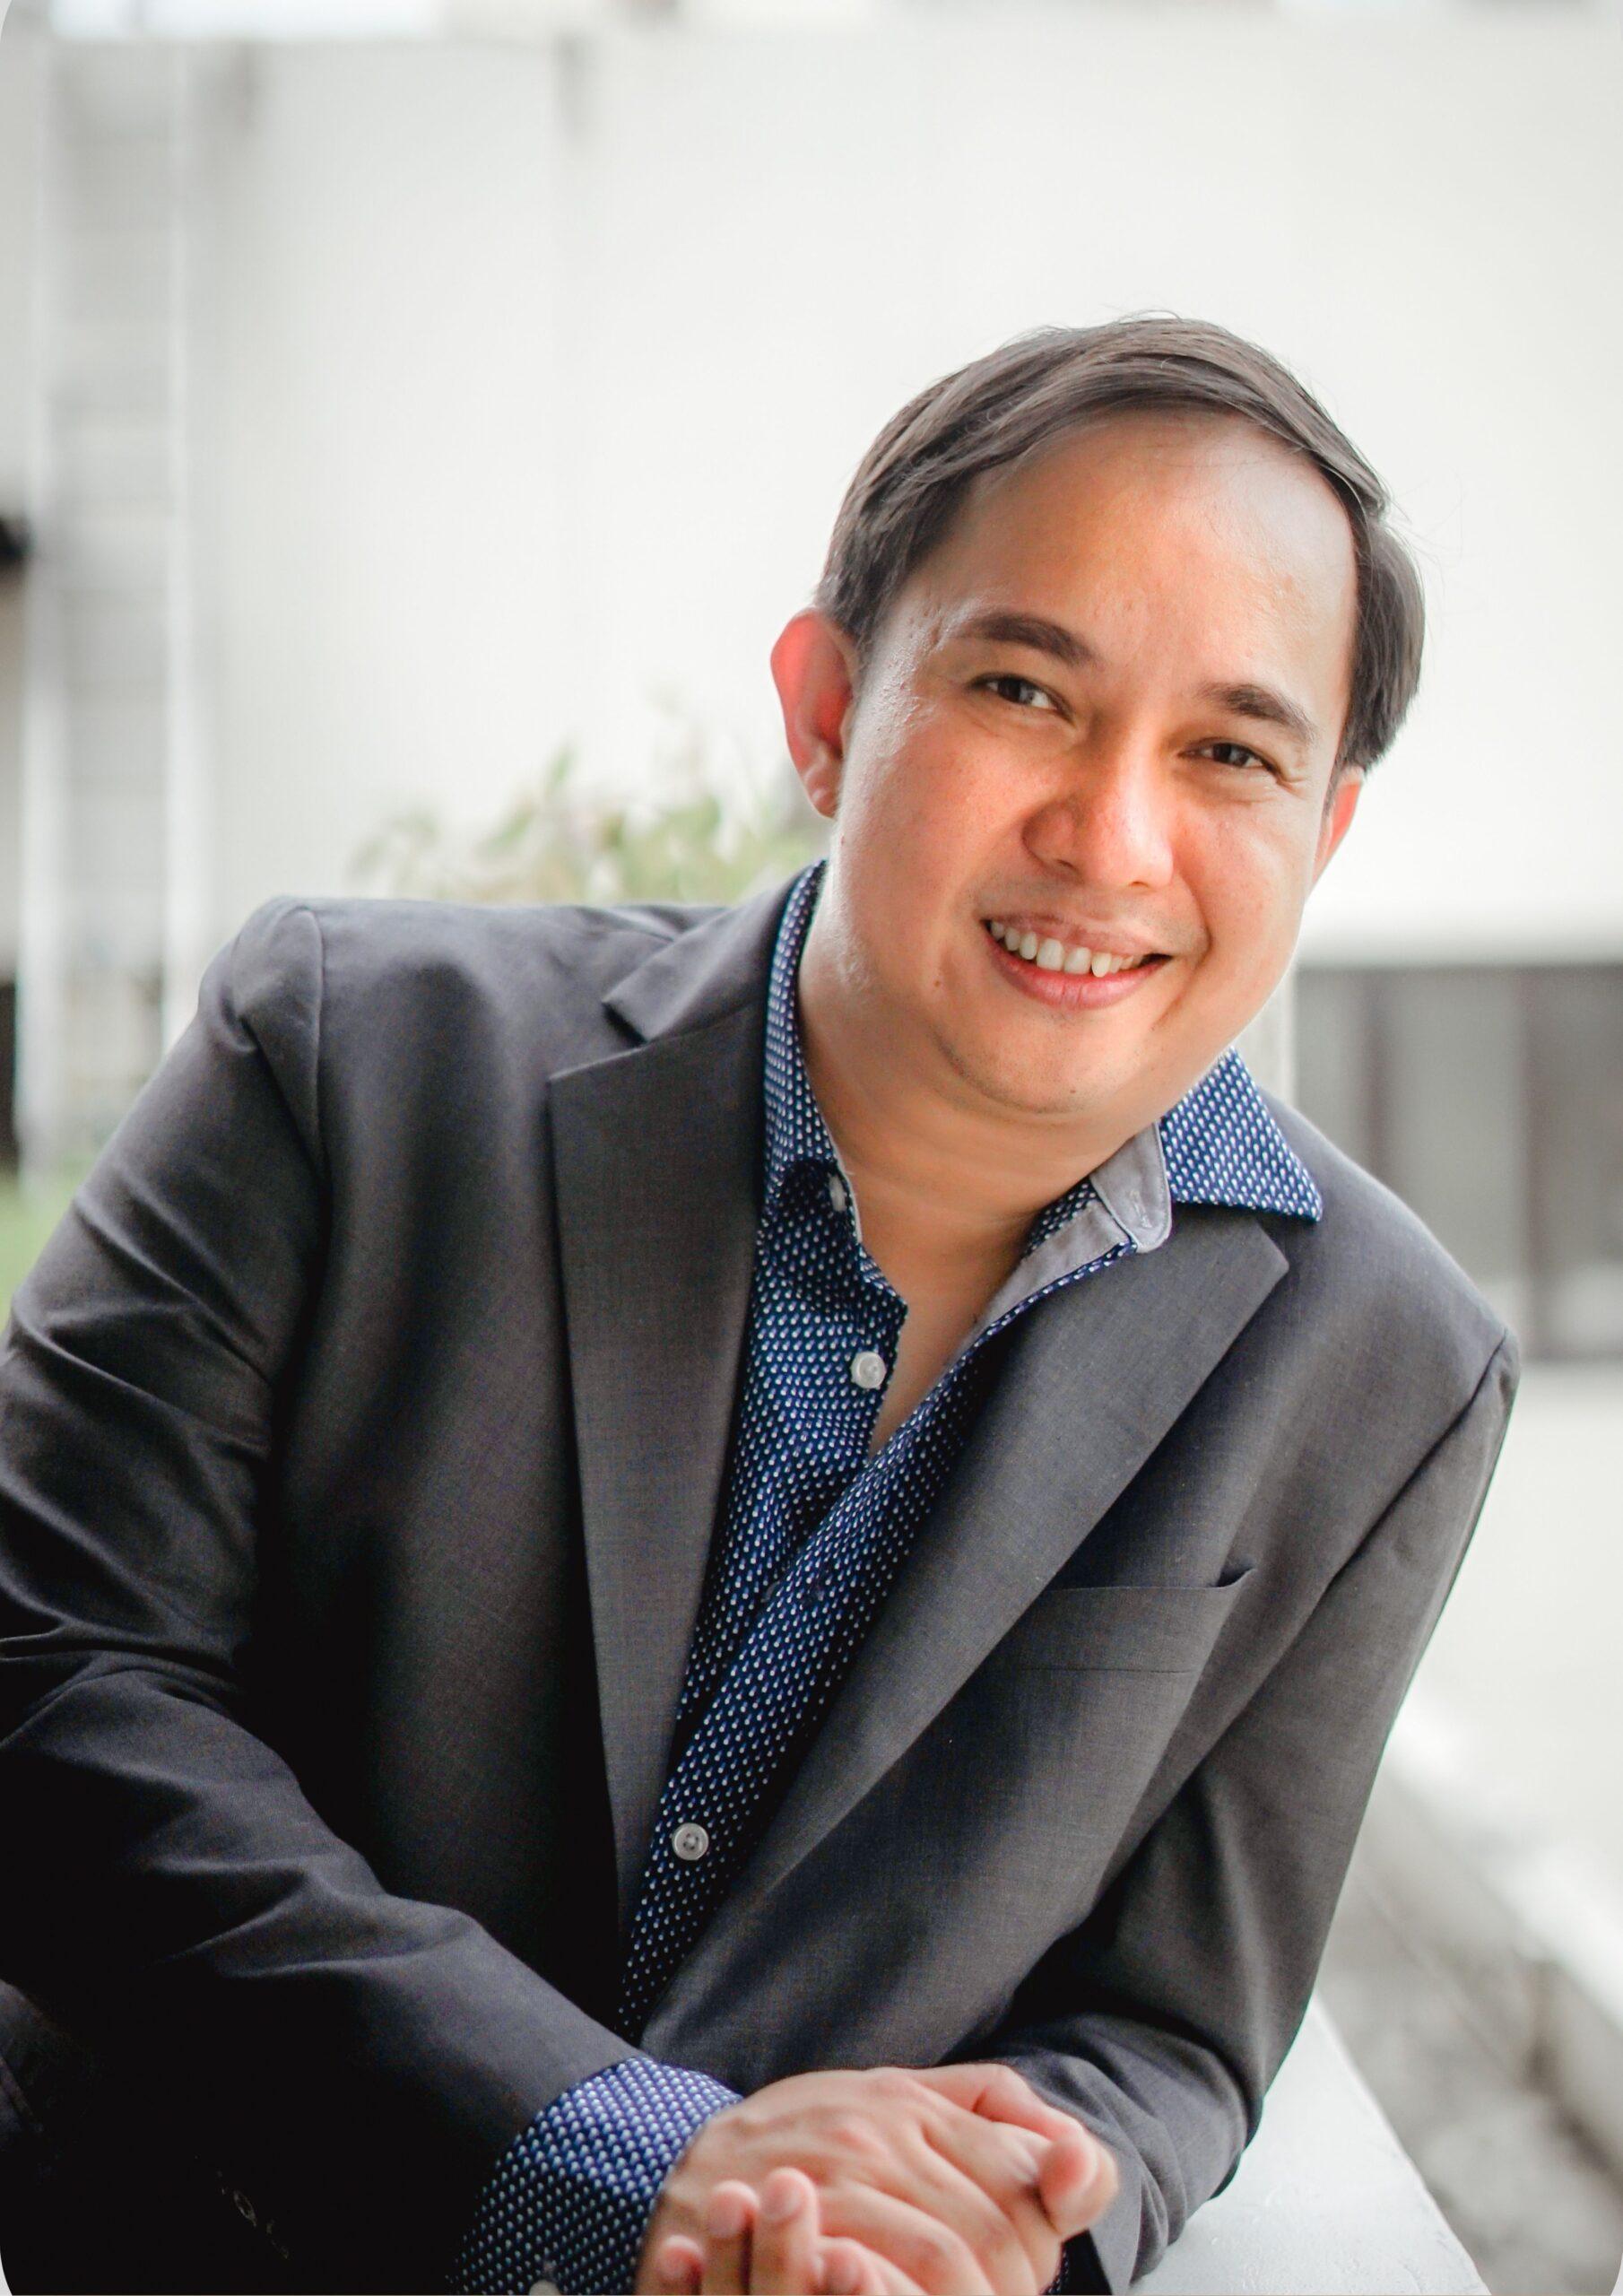 Dr. Christopher Monterola